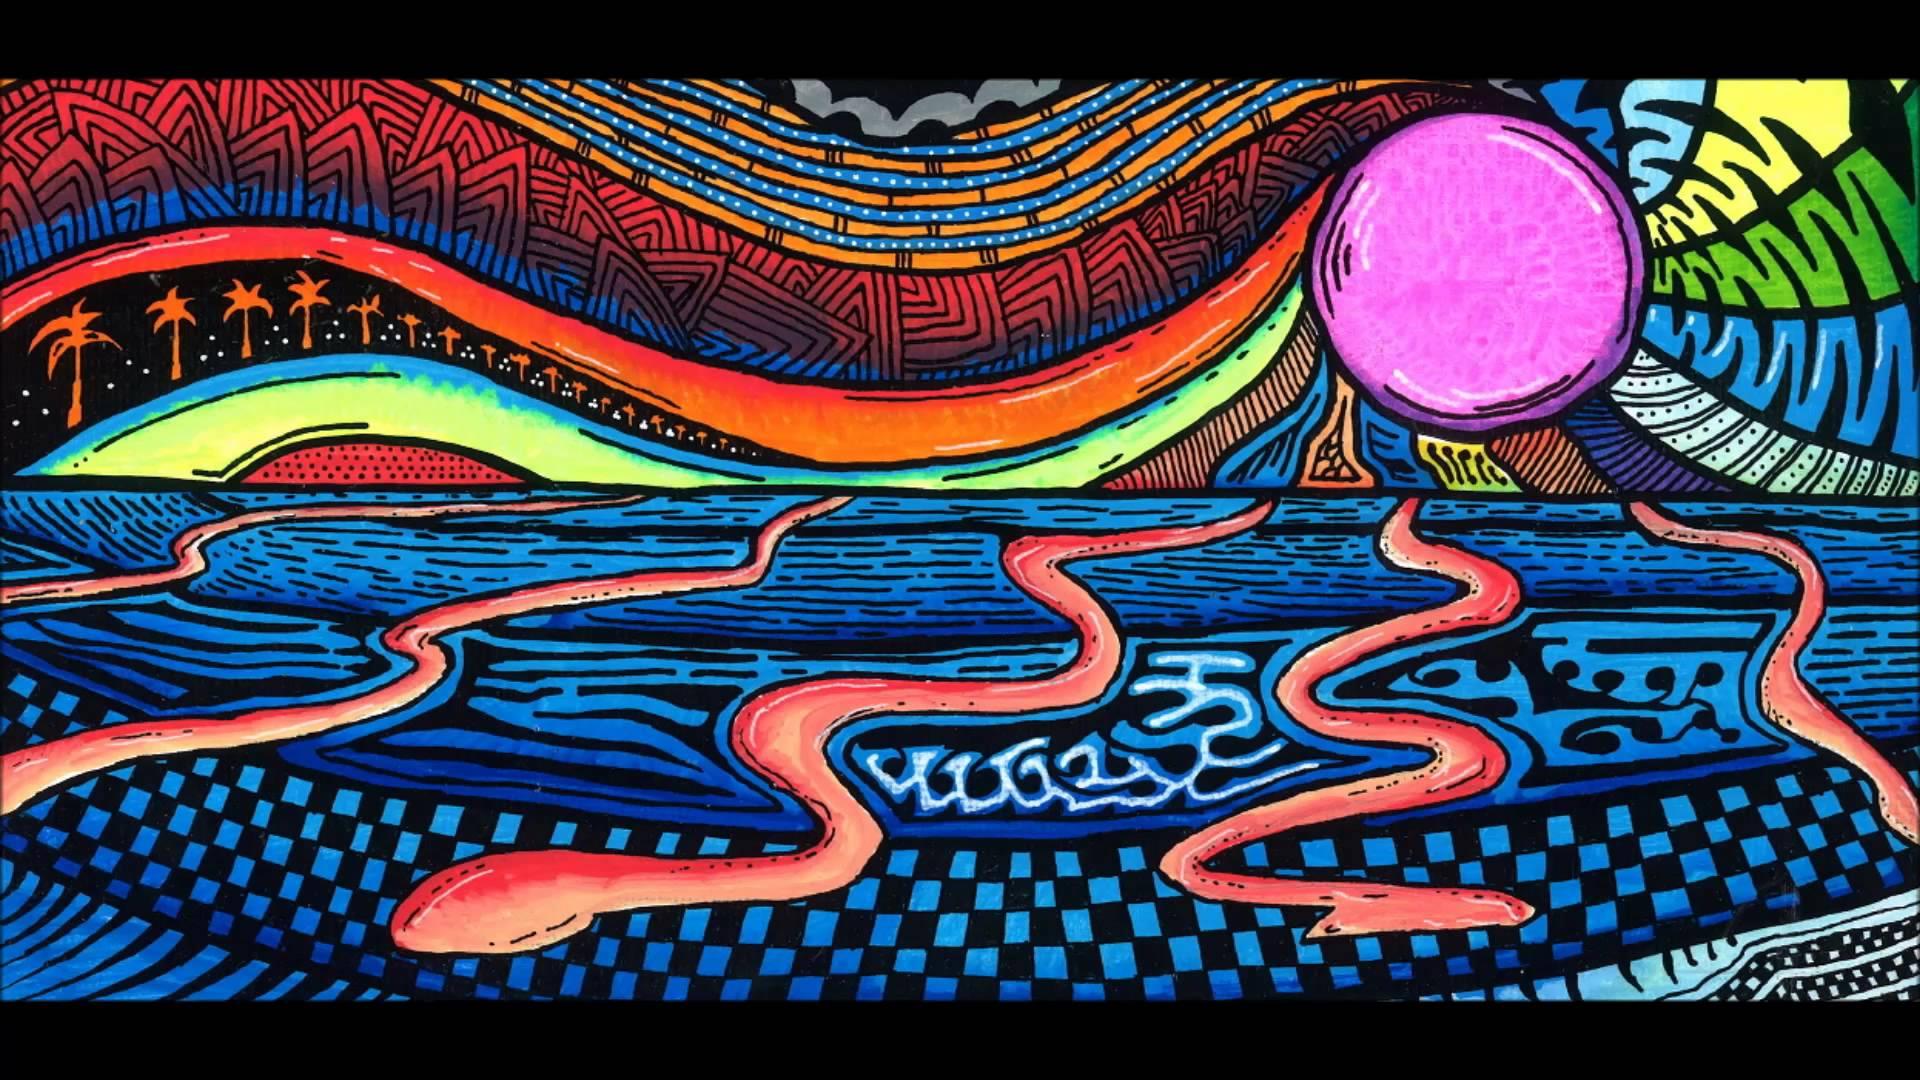 Grateful Dead Backgrounds (32 Wallpapers) - Adorable ...